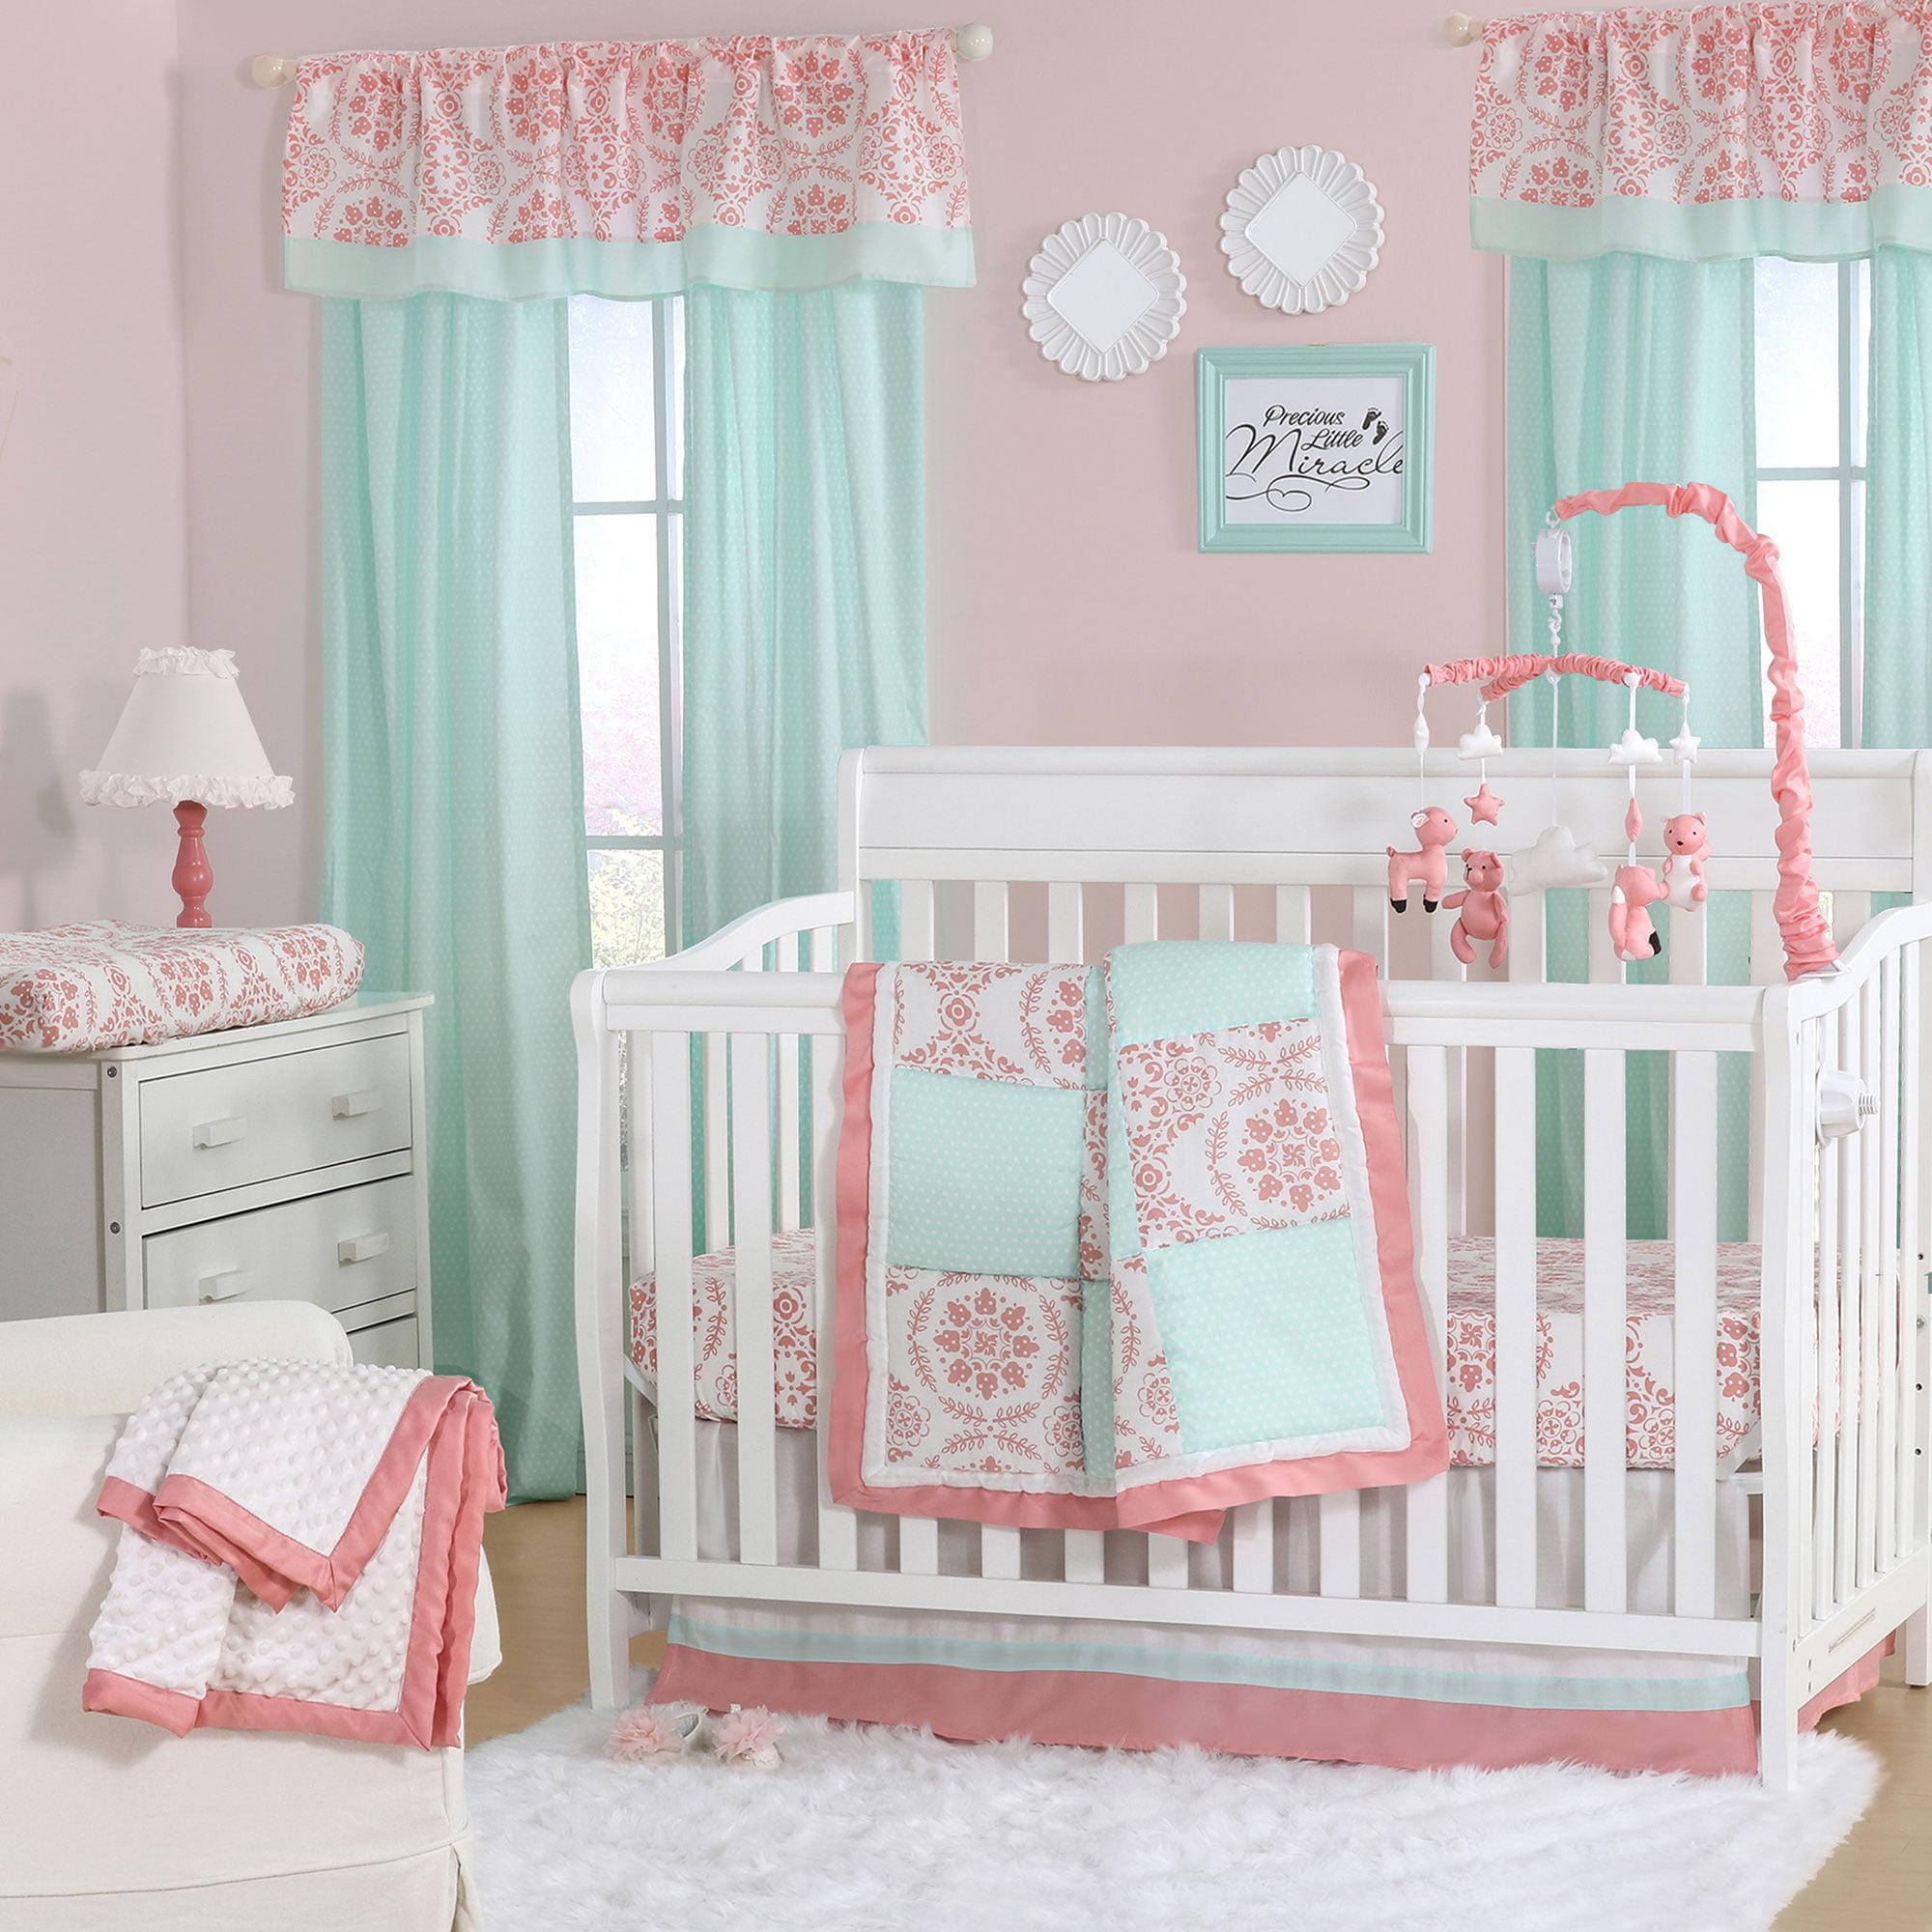 The Peanut Shell 3 Piece Baby Crib Bedding Set - Mint Gre...